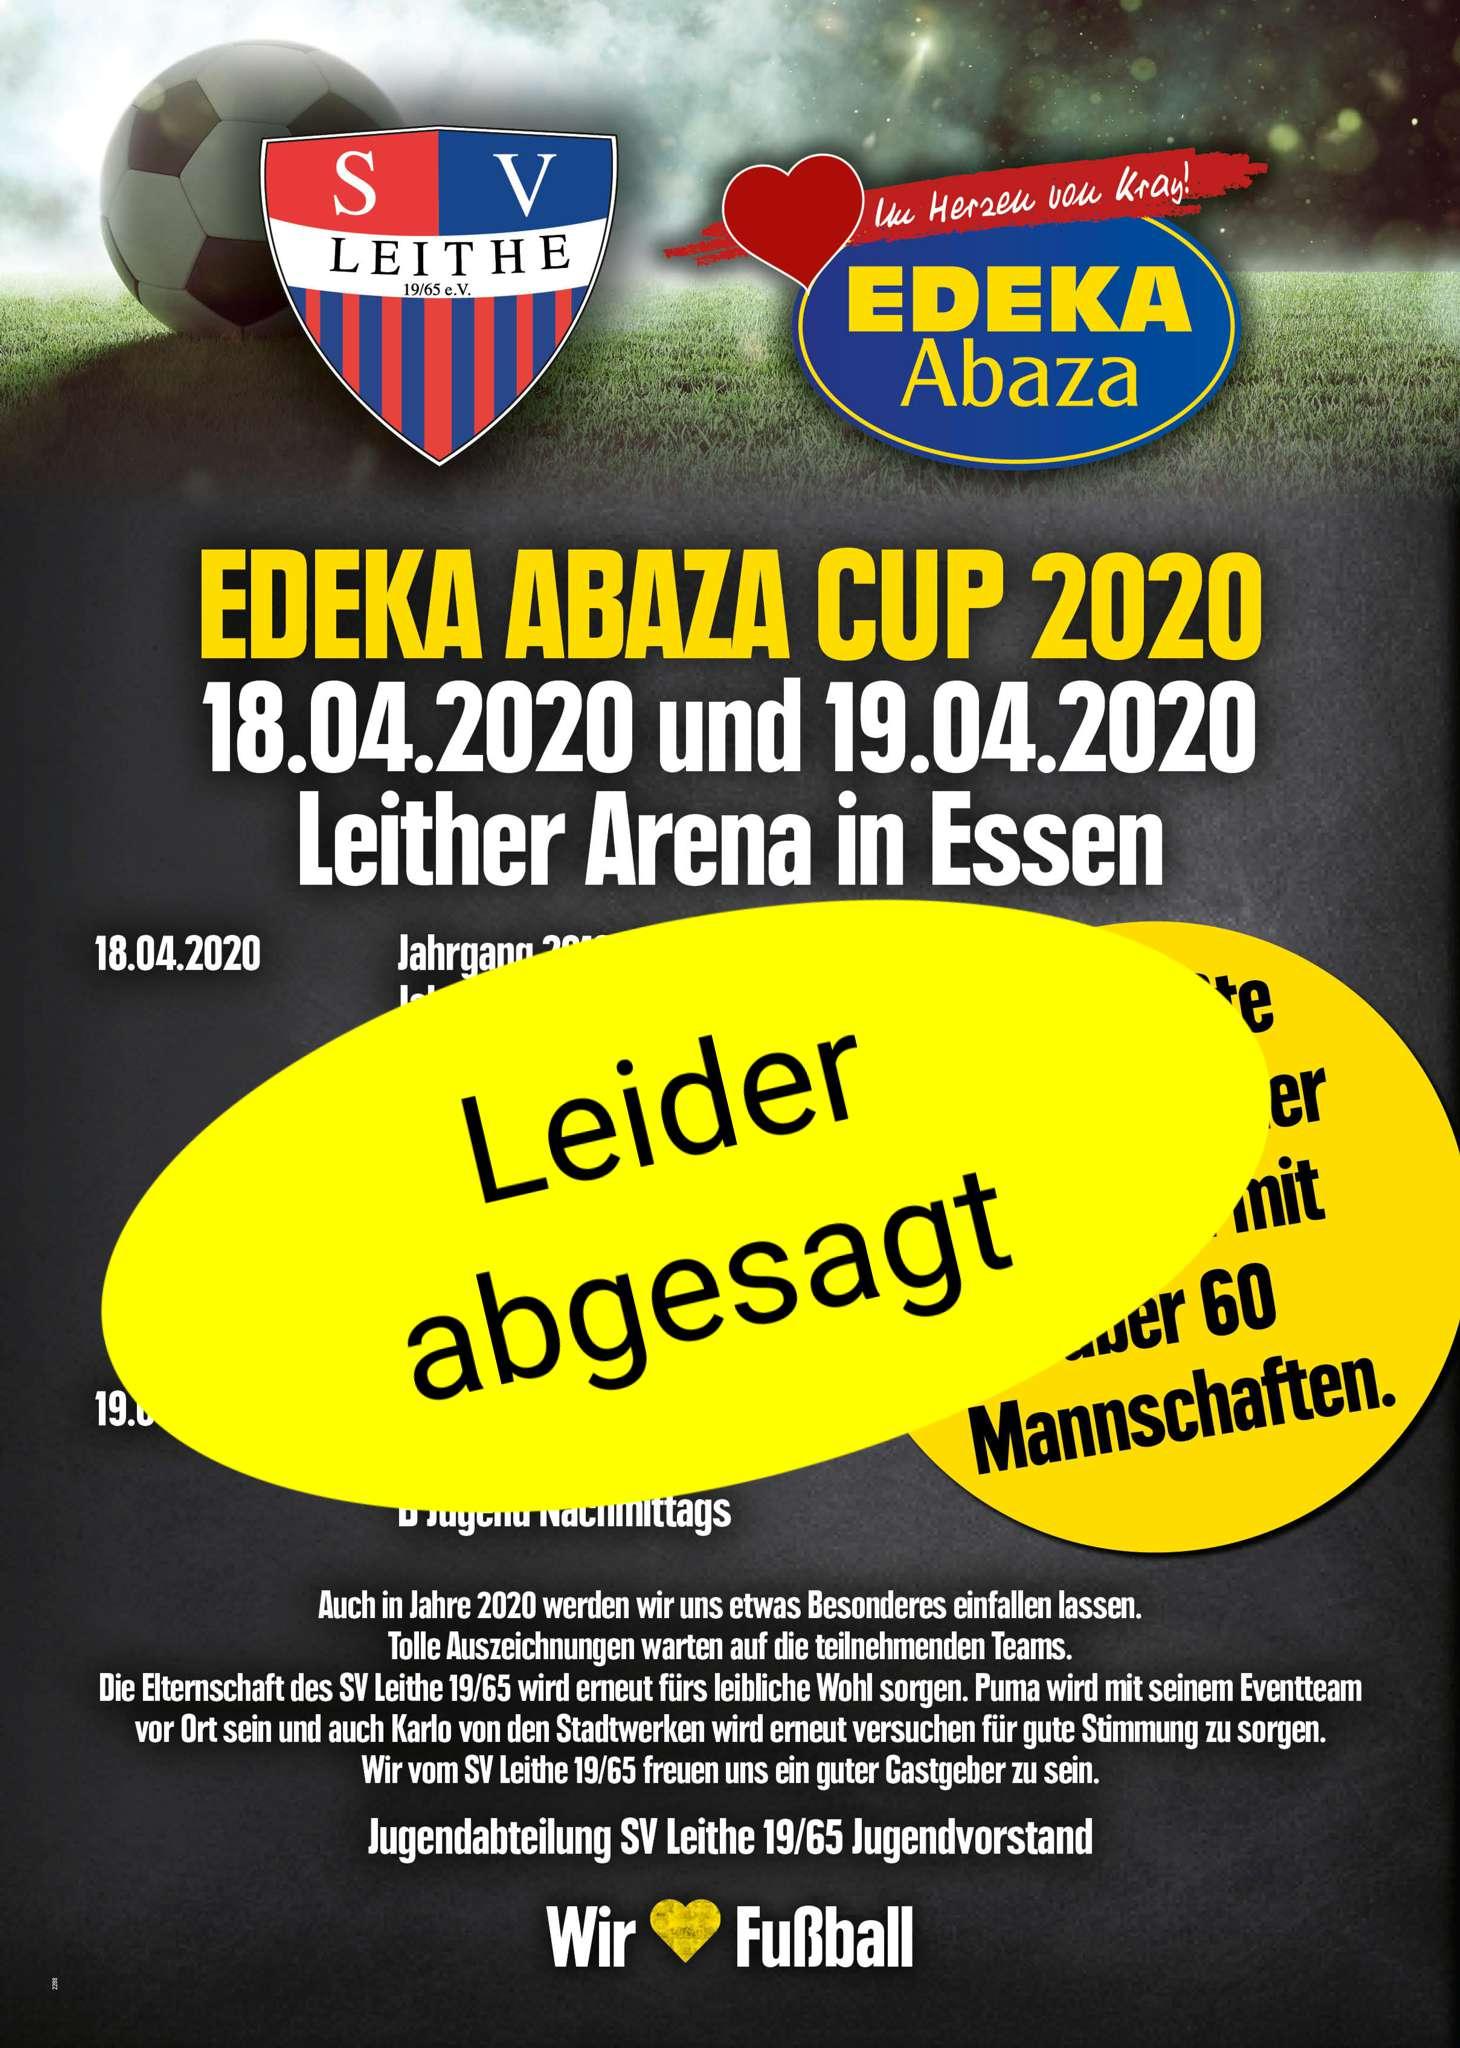 Großes EDEKA Abaza Fußballturnier